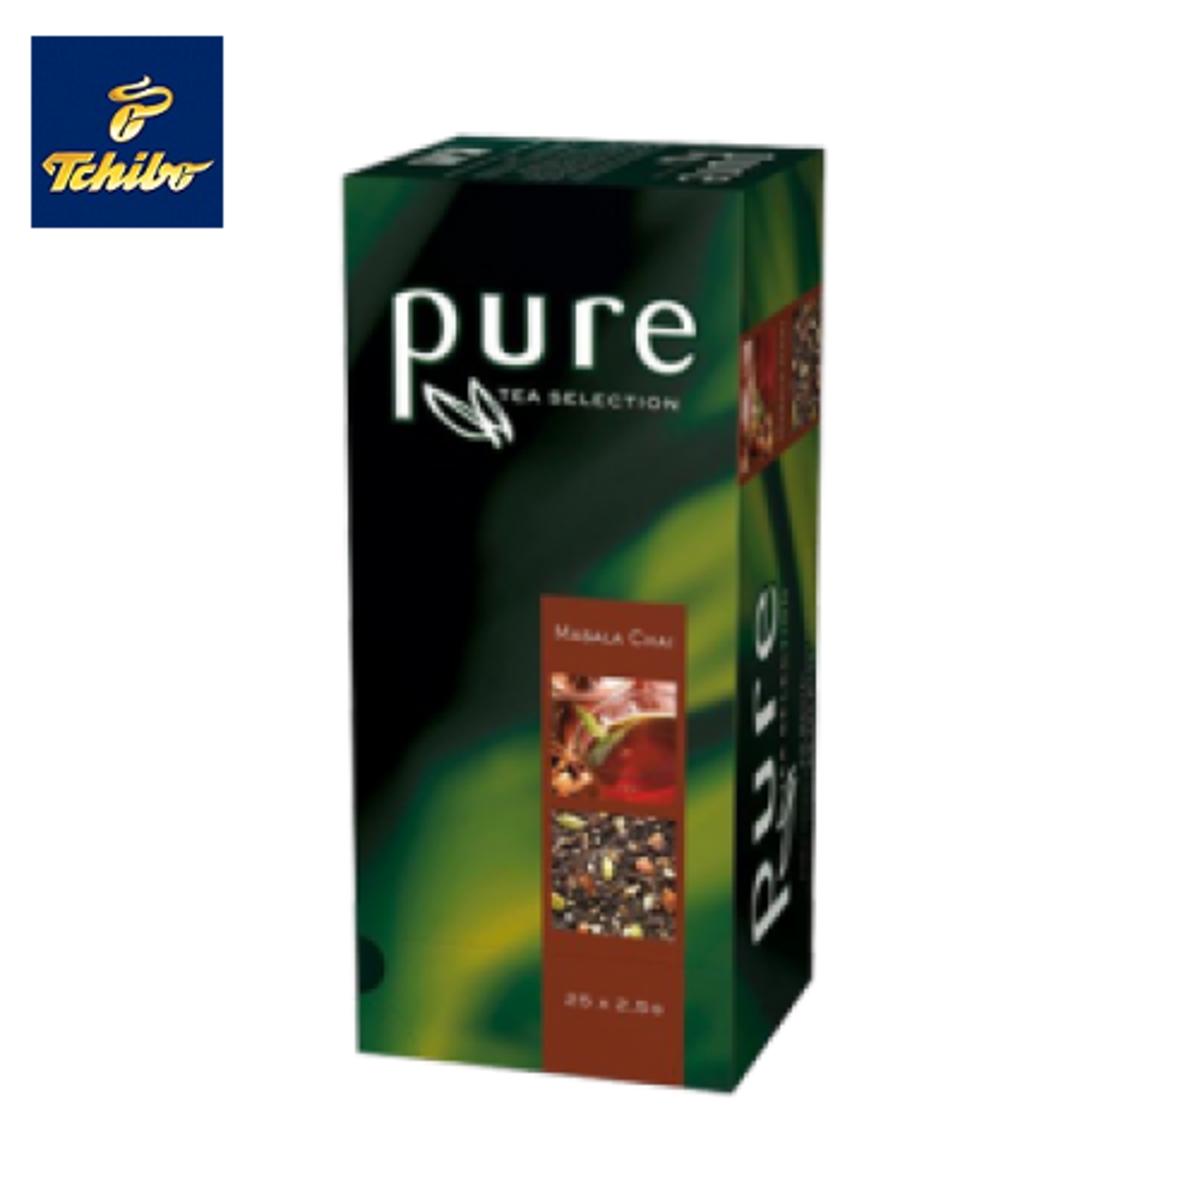 Pure Tea Selection - Масала Чай